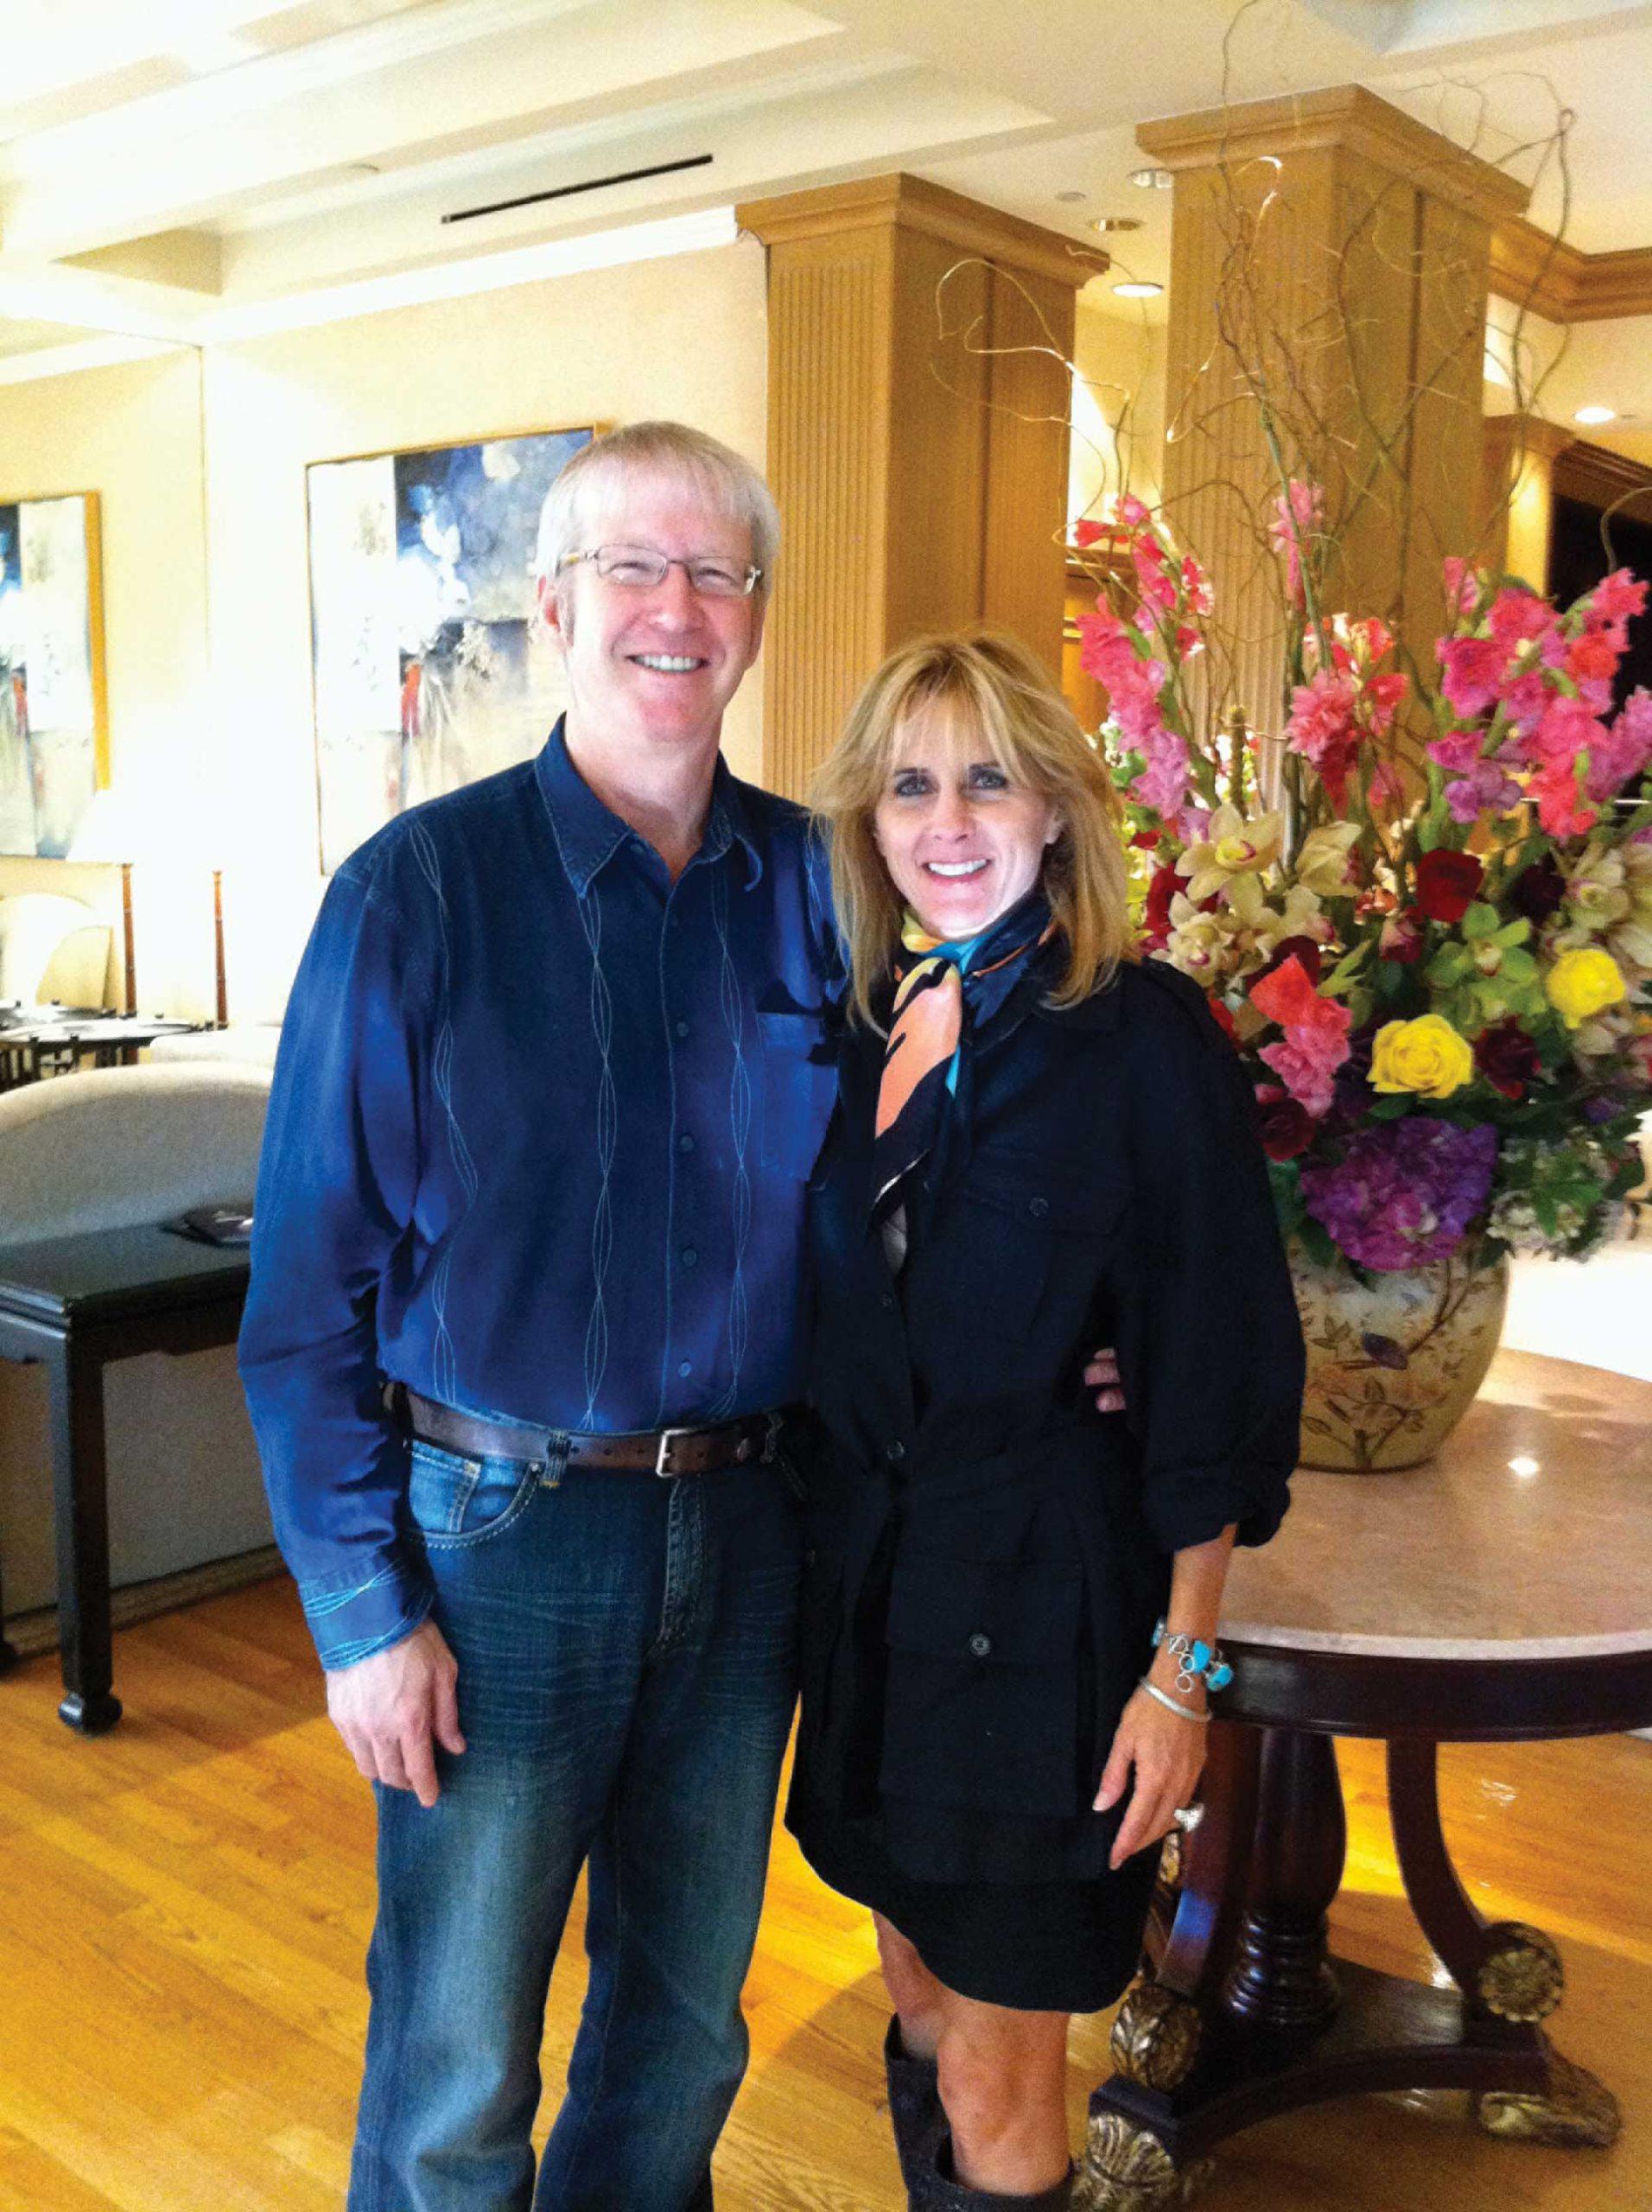 America's Vet: Dr. Marty Becker Houston Book Tour May 24